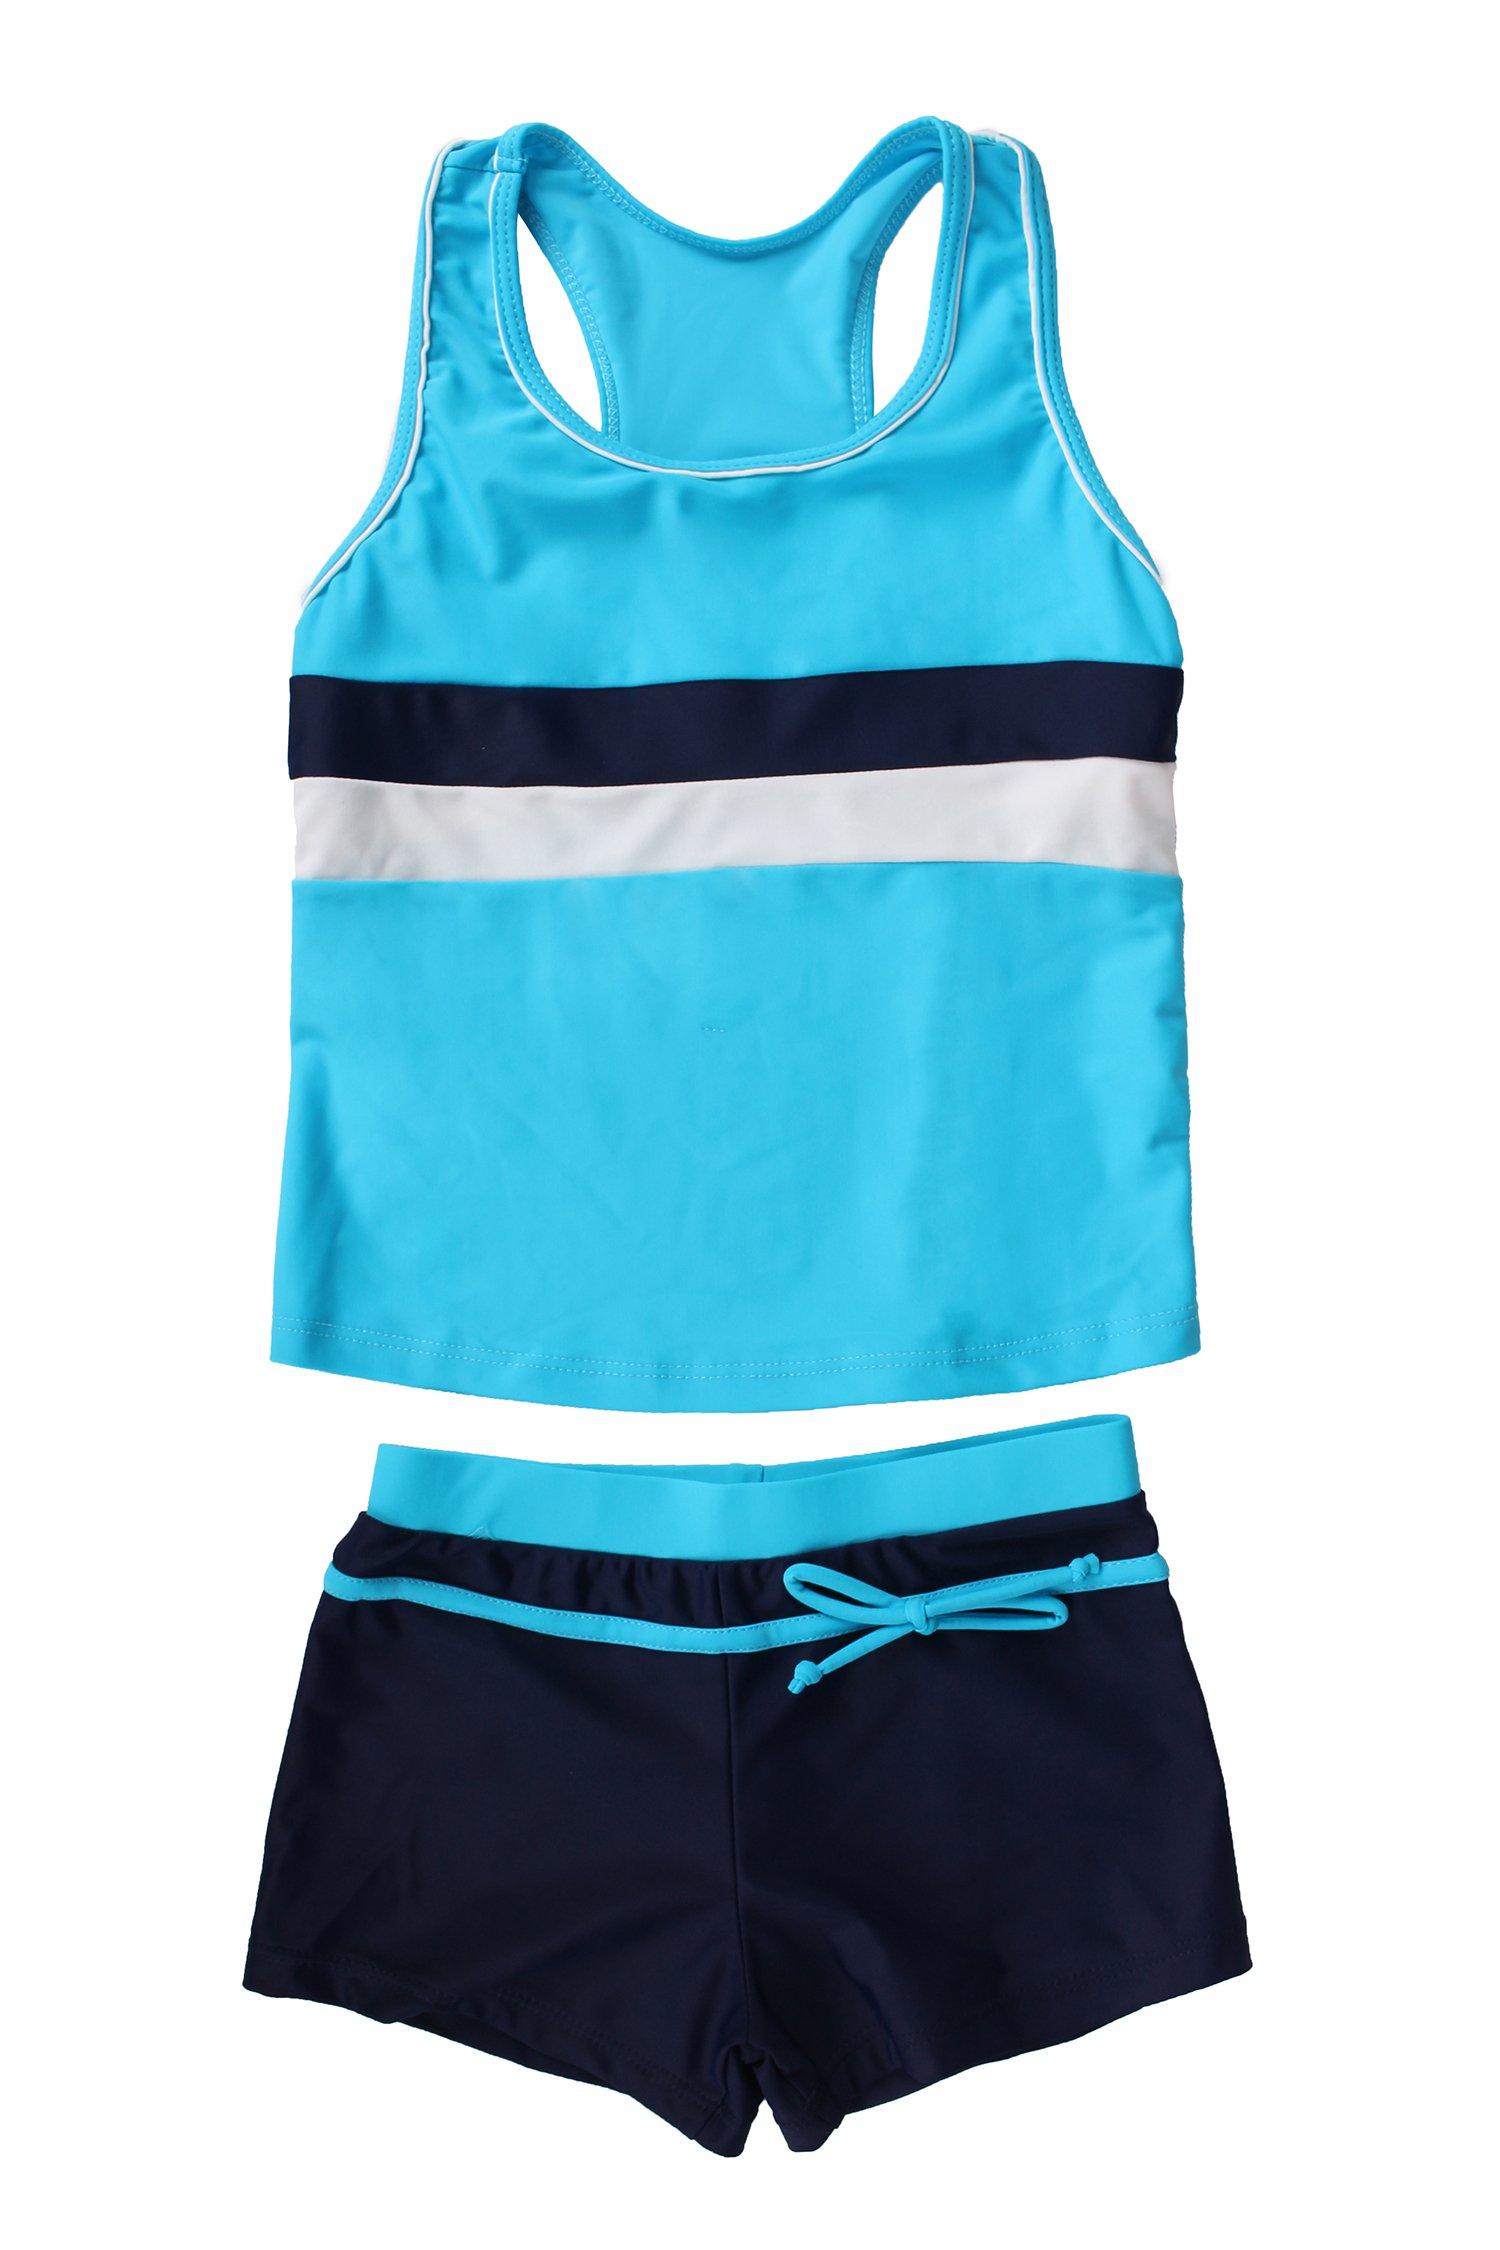 JerrisApparel Little Girls' Summer Two Piece Boyshort Tankini Kids Swimsuit (6-7/Tag Size XL, Blue)